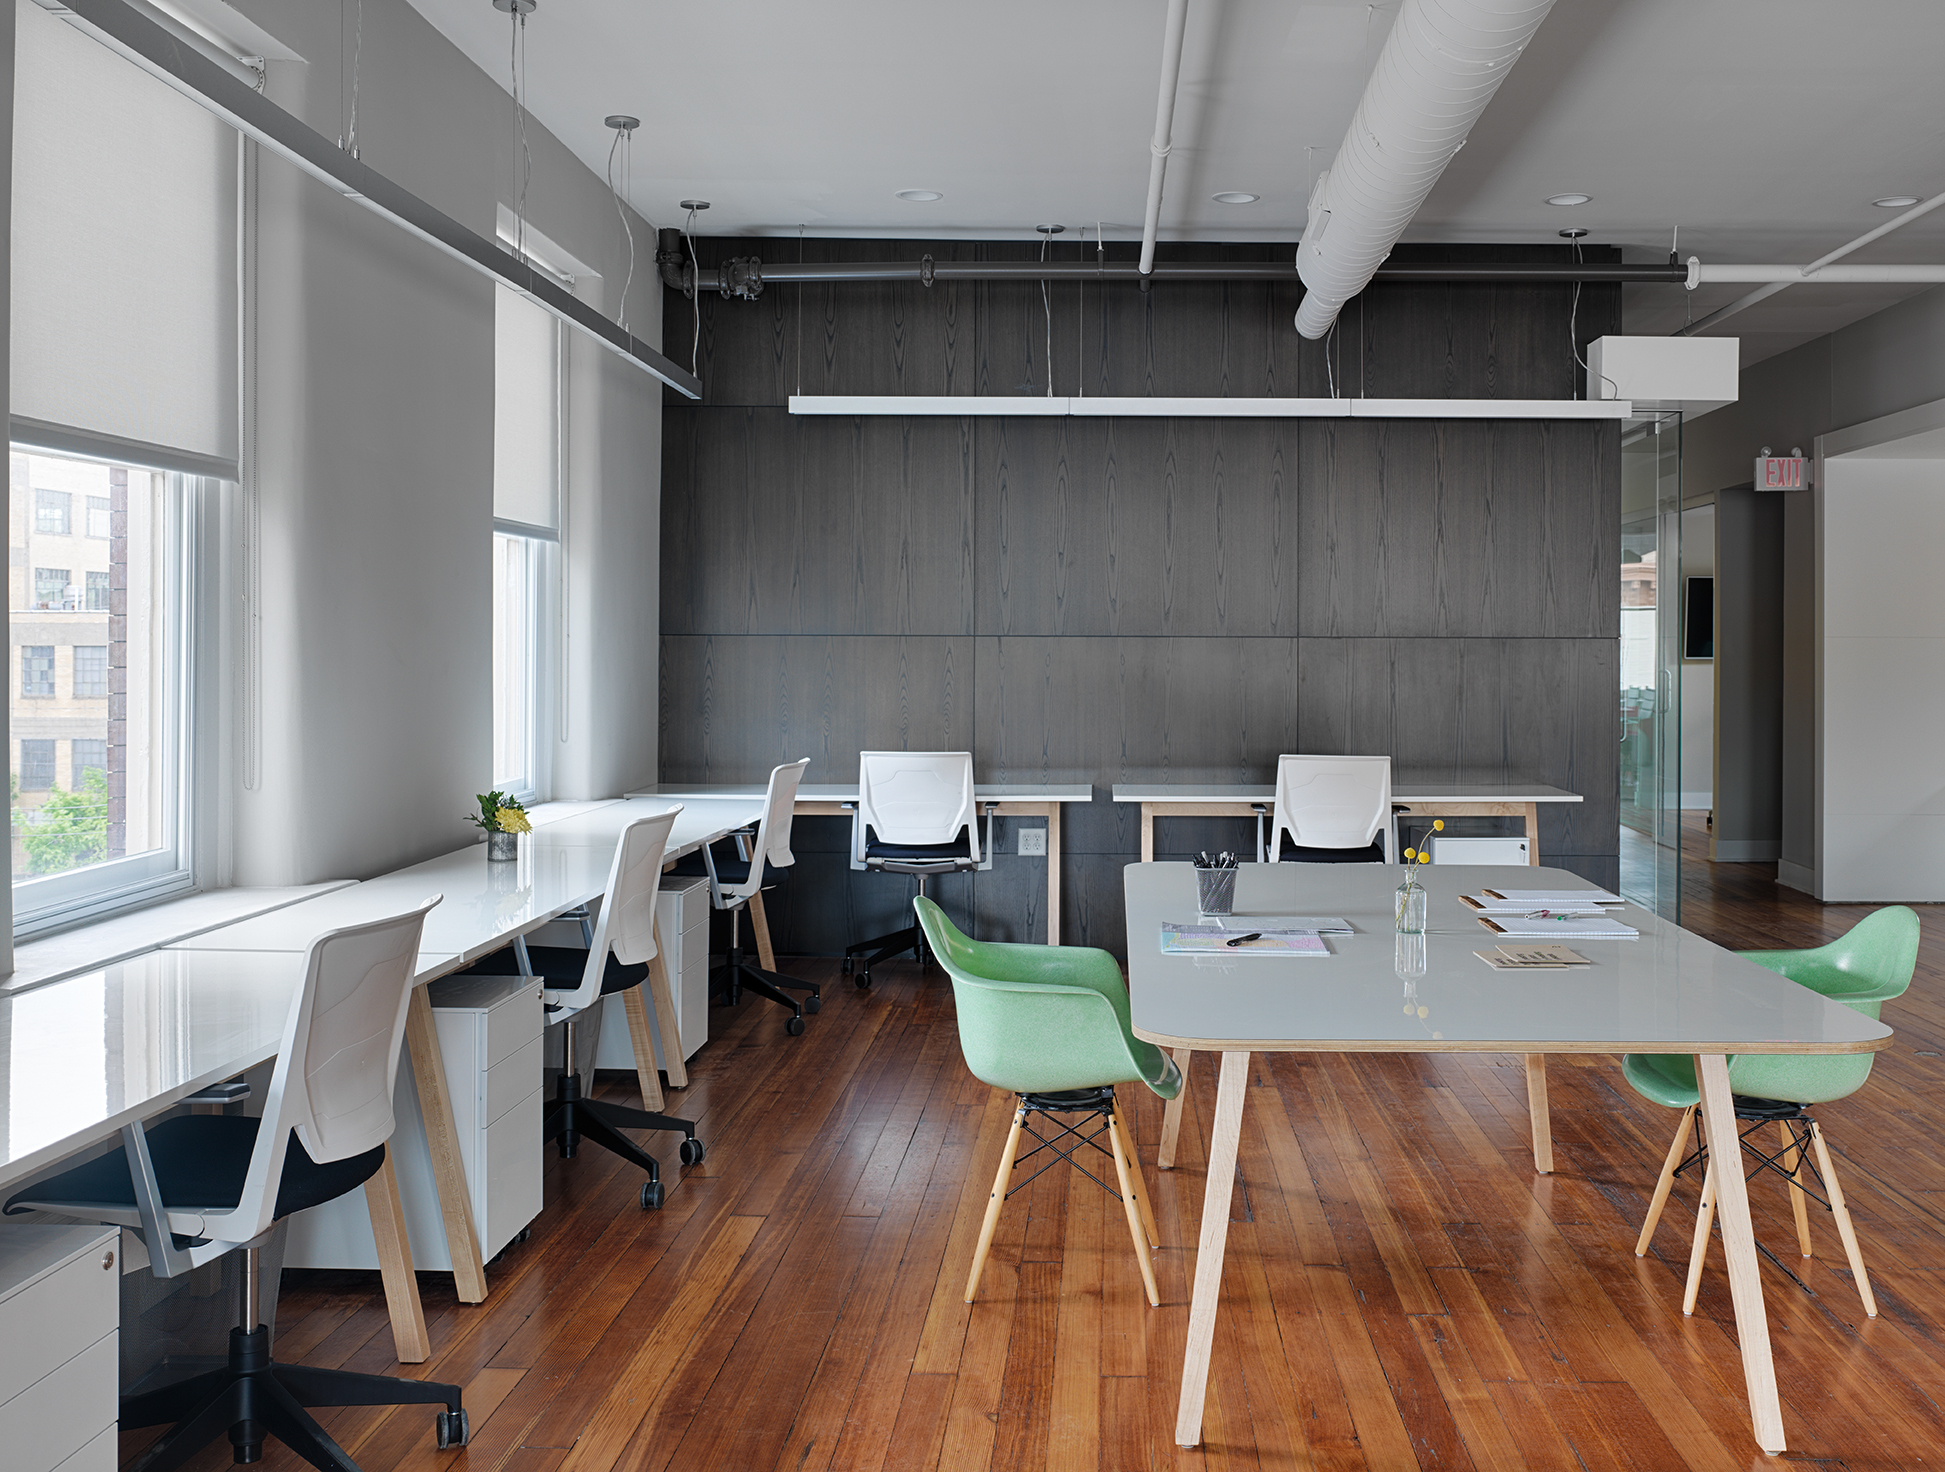 maple and laminate desks